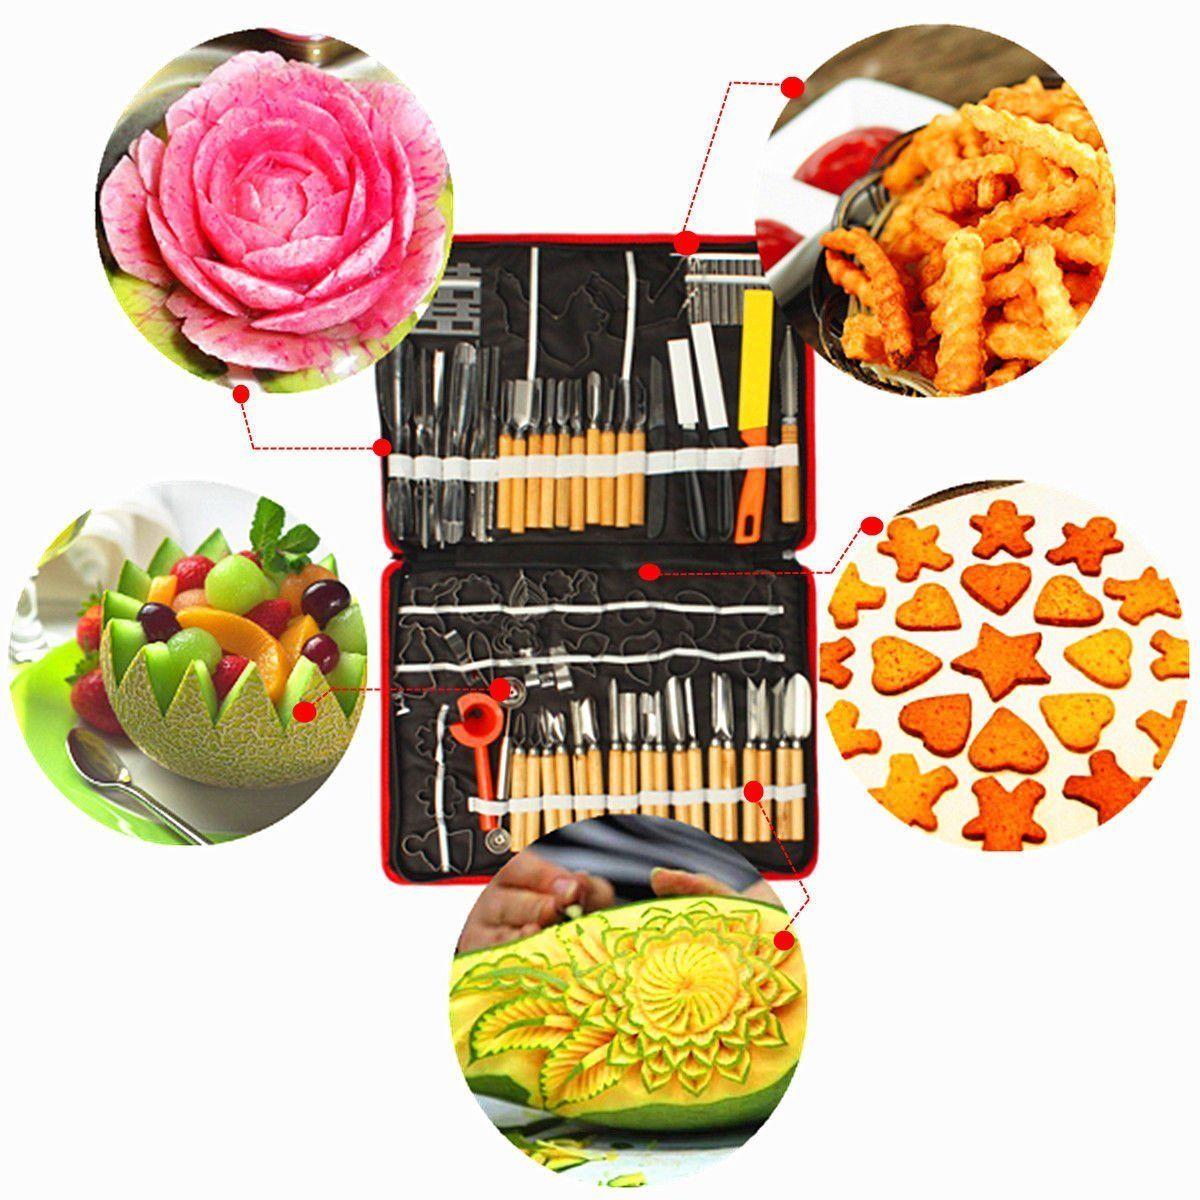 80pcs/Set Portable Vegetable Food Fruit Wood Box Kitchen Carving Tool Kit